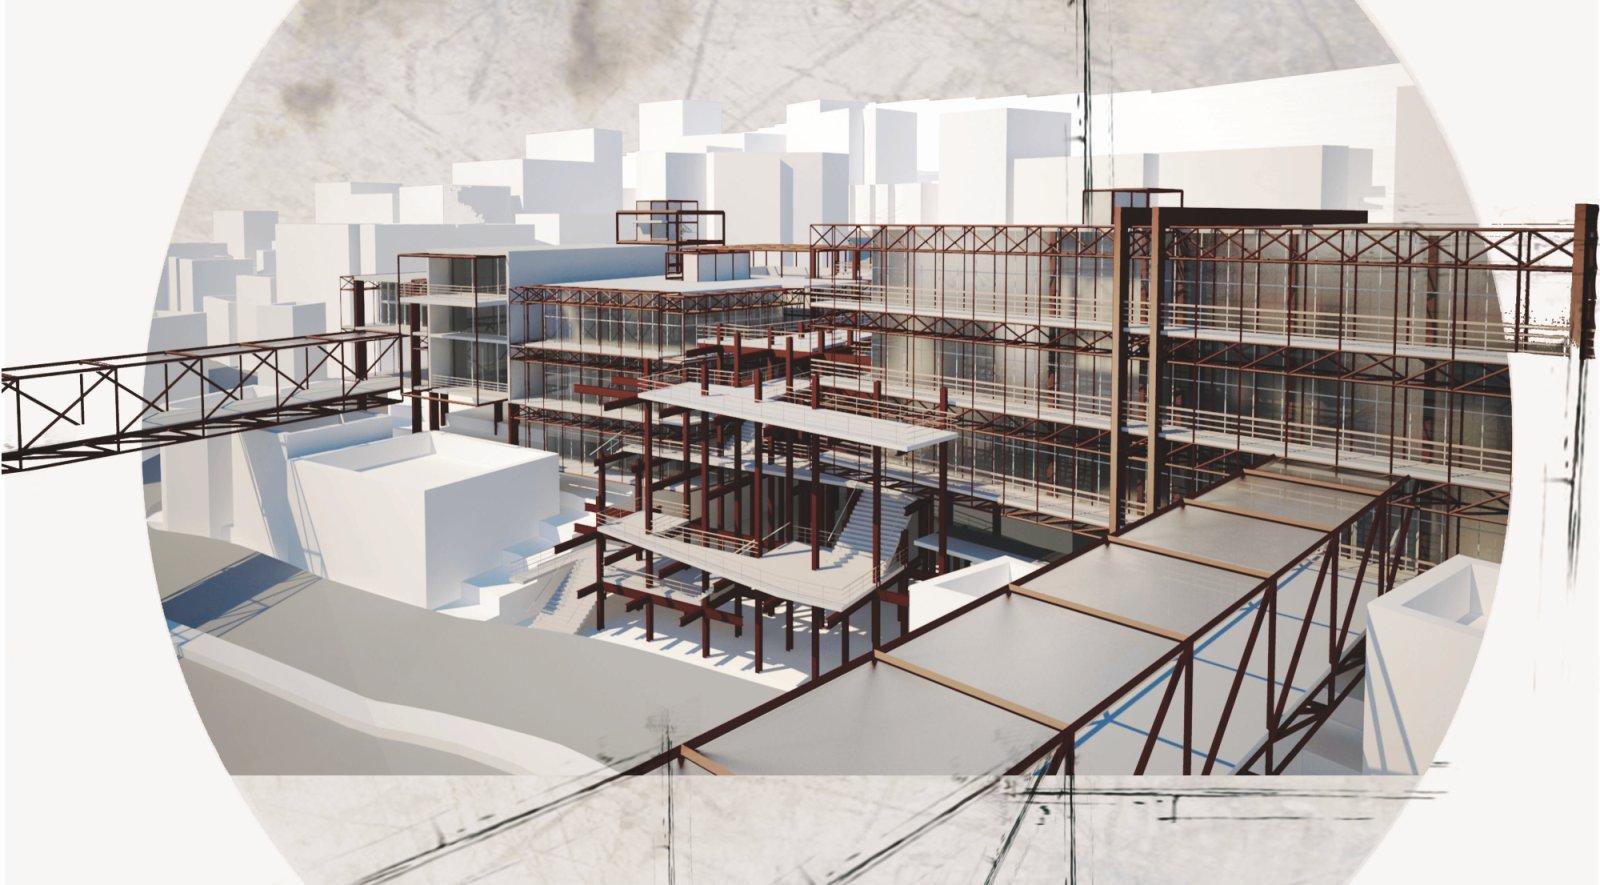 Architectural Experimental Campus